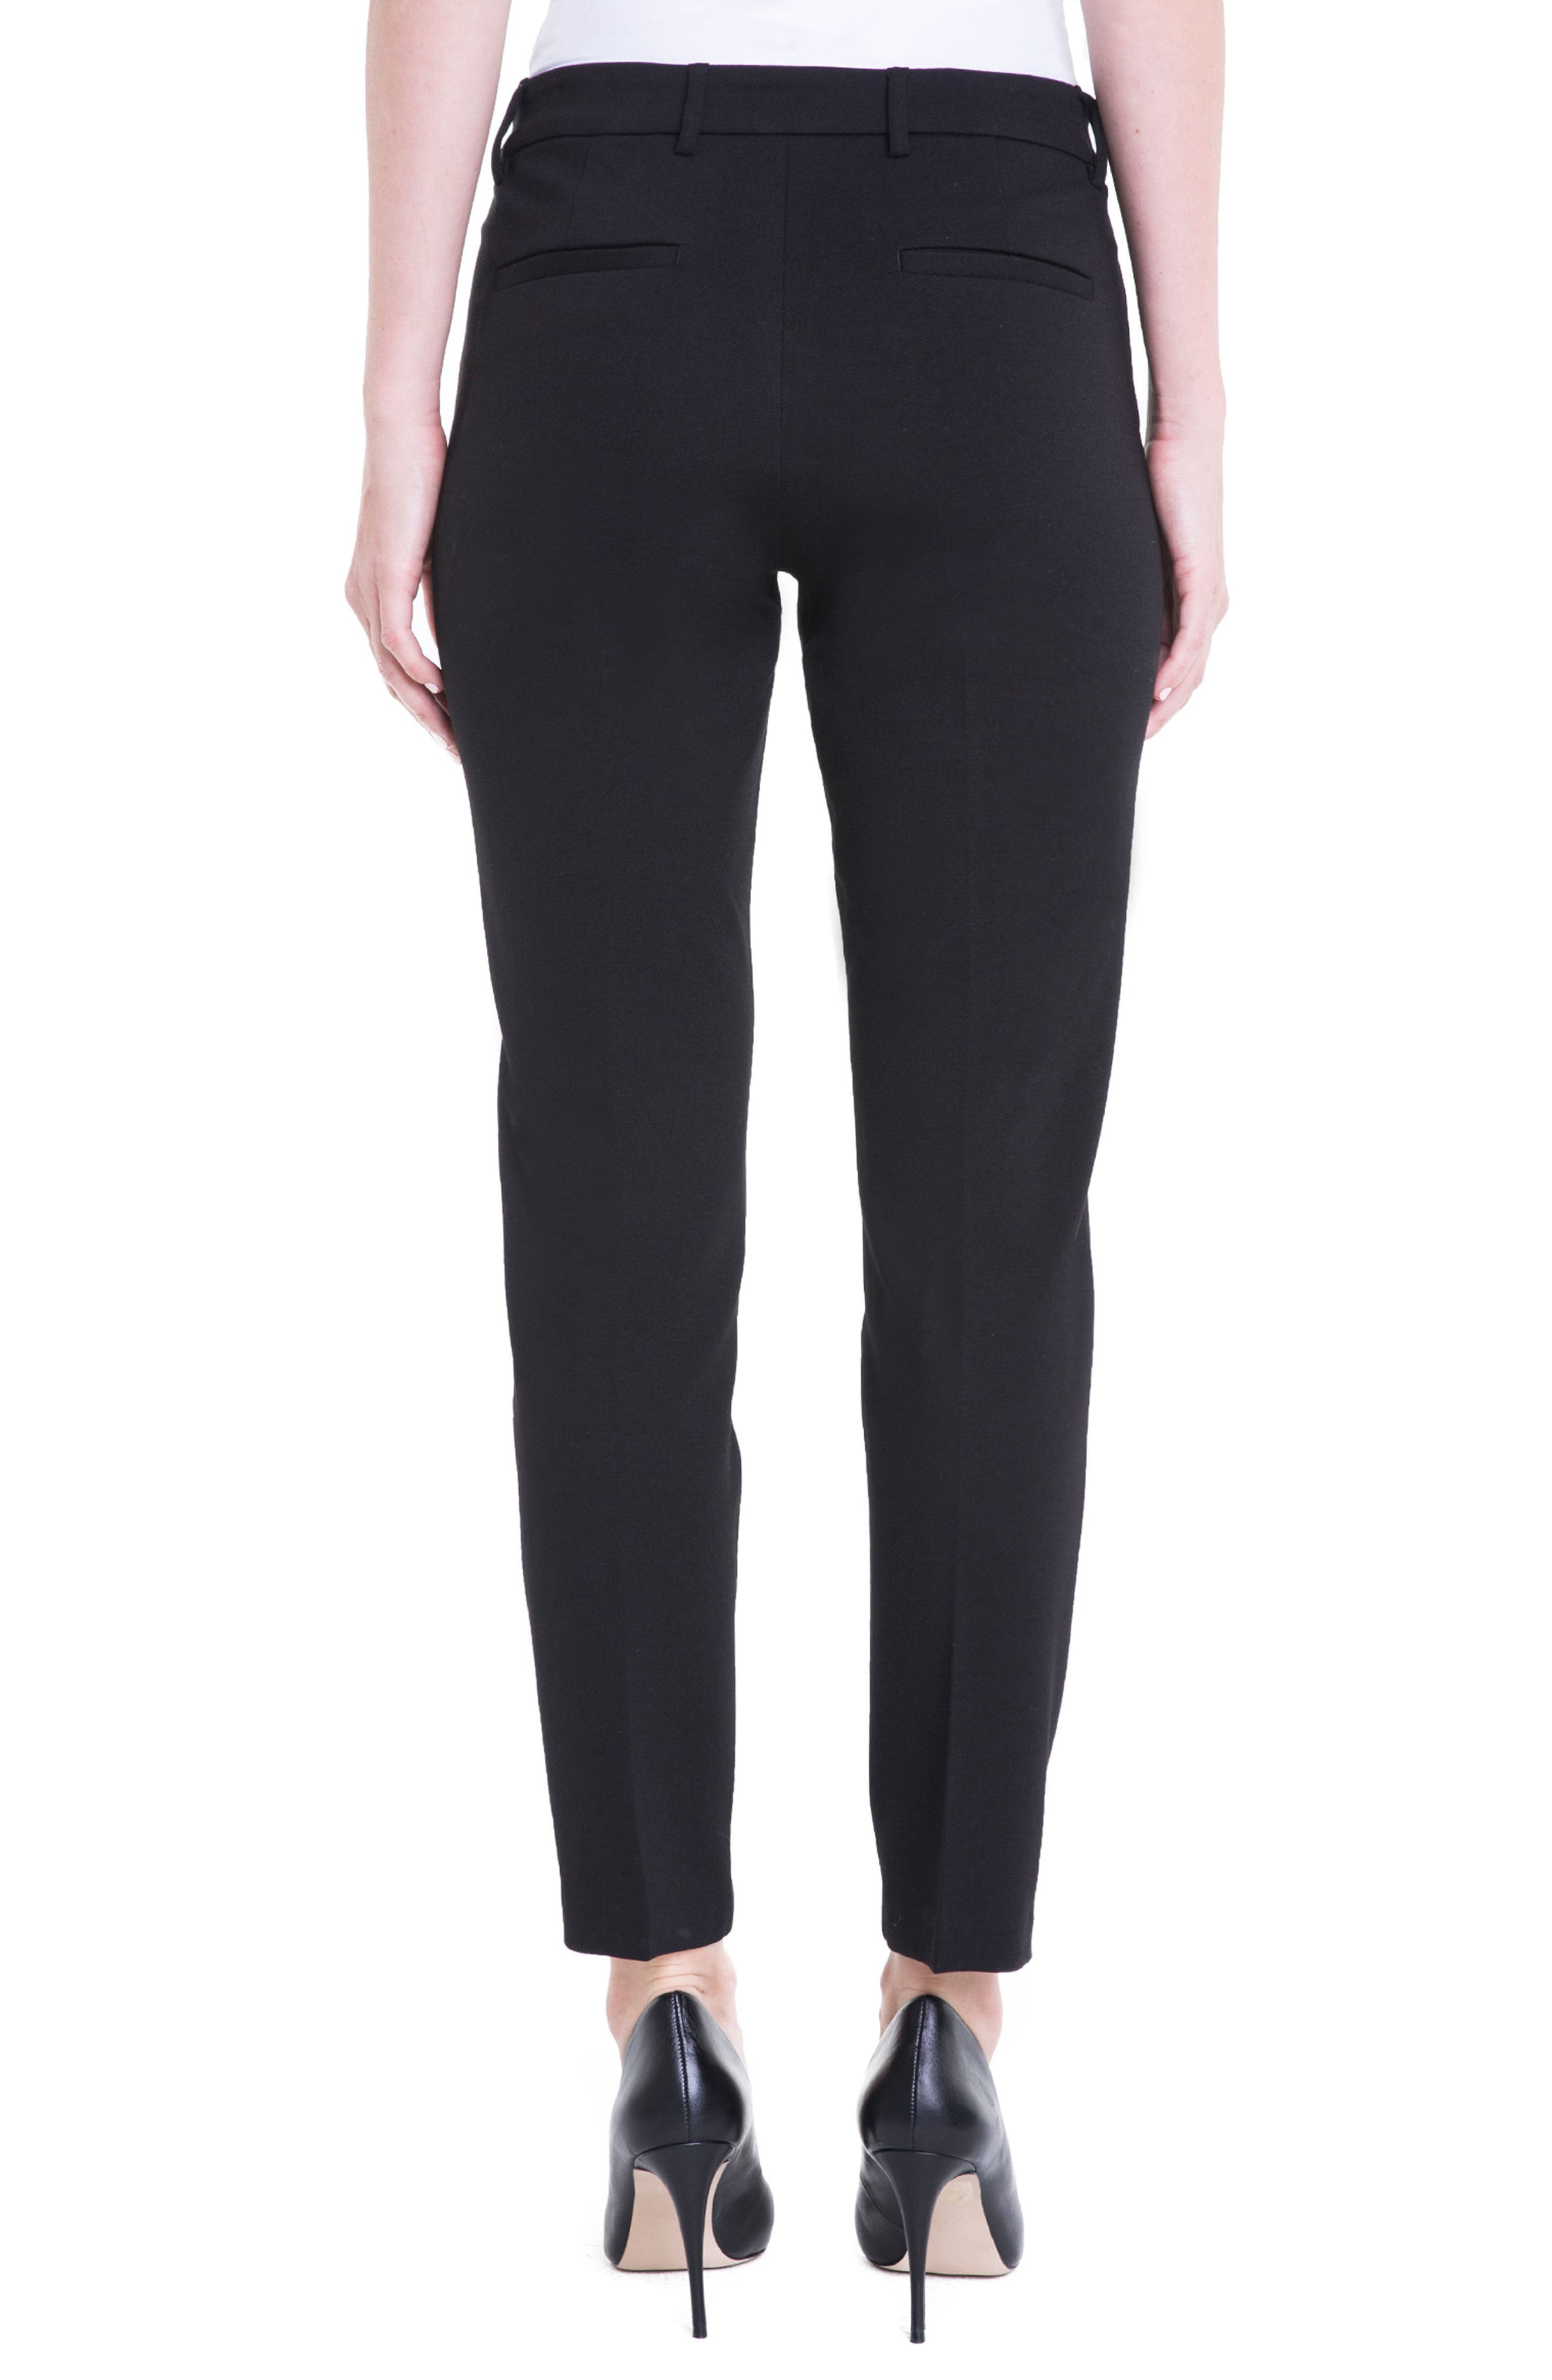 Kelsey Knit Trousers,                             Alternate thumbnail 2, color,                             BLACK